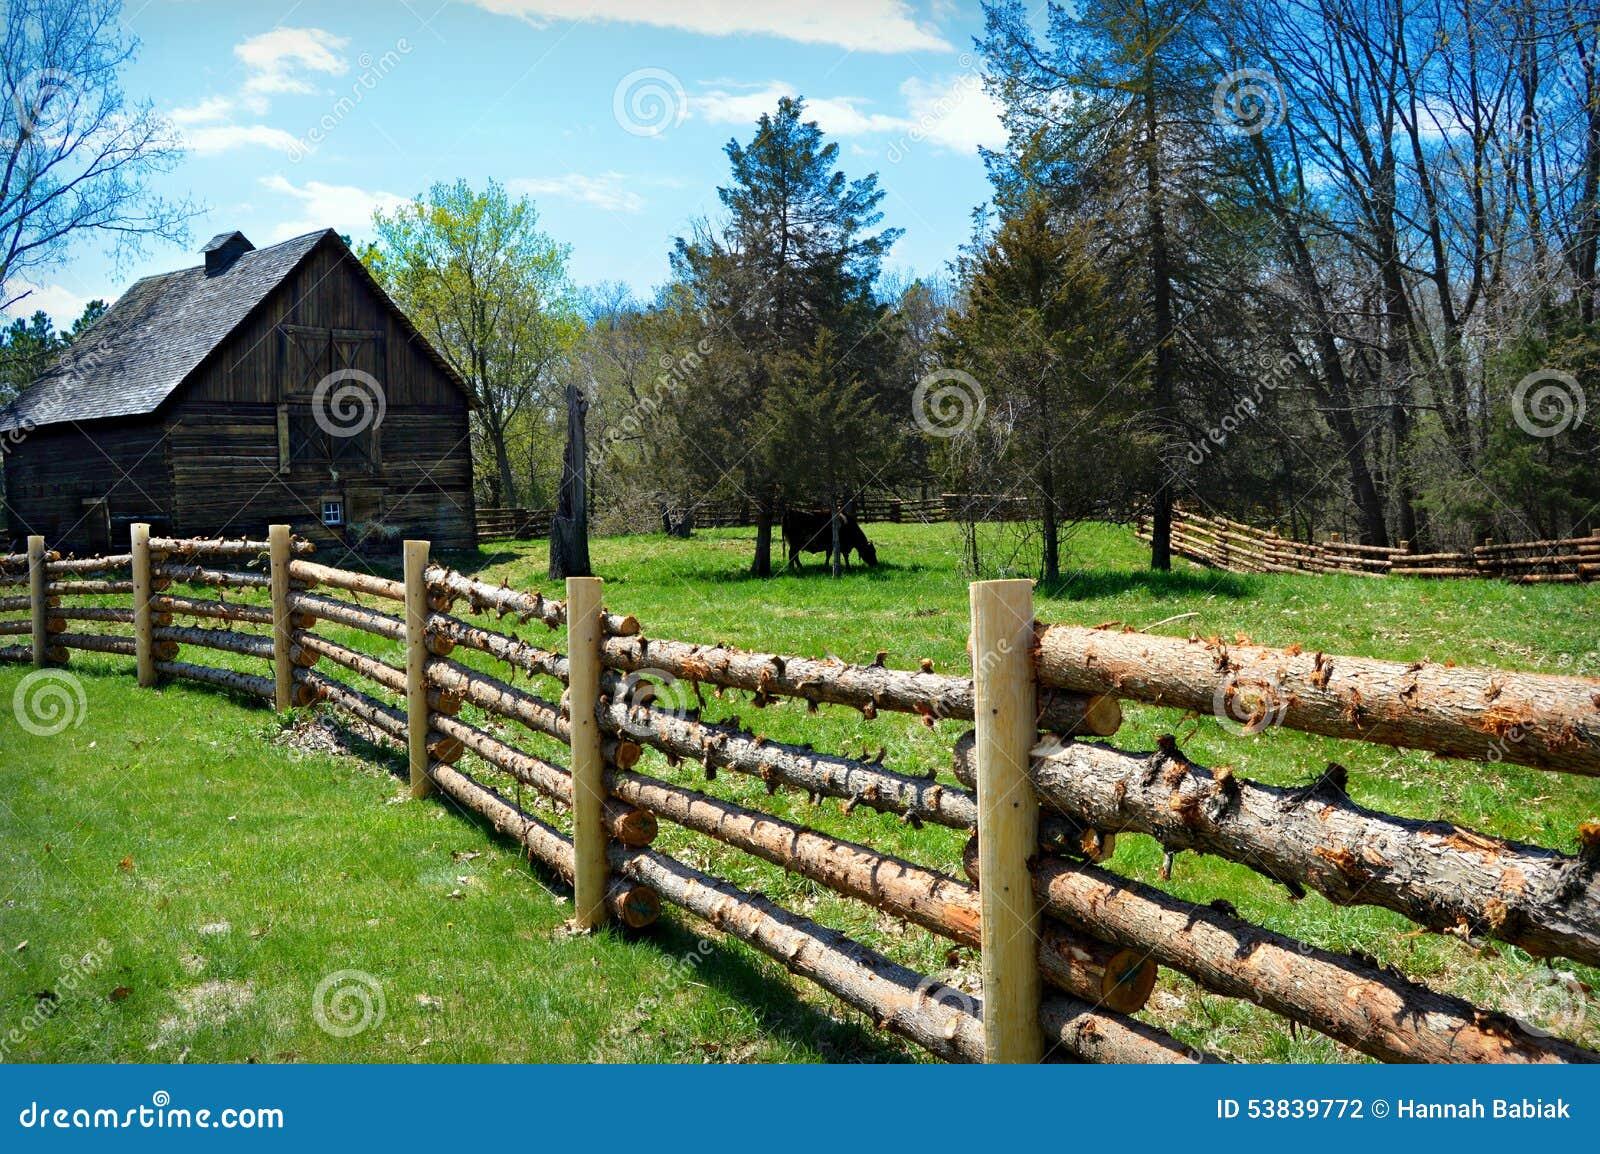 Log Fence Barn Cow Stock Photo - Image: 53839772